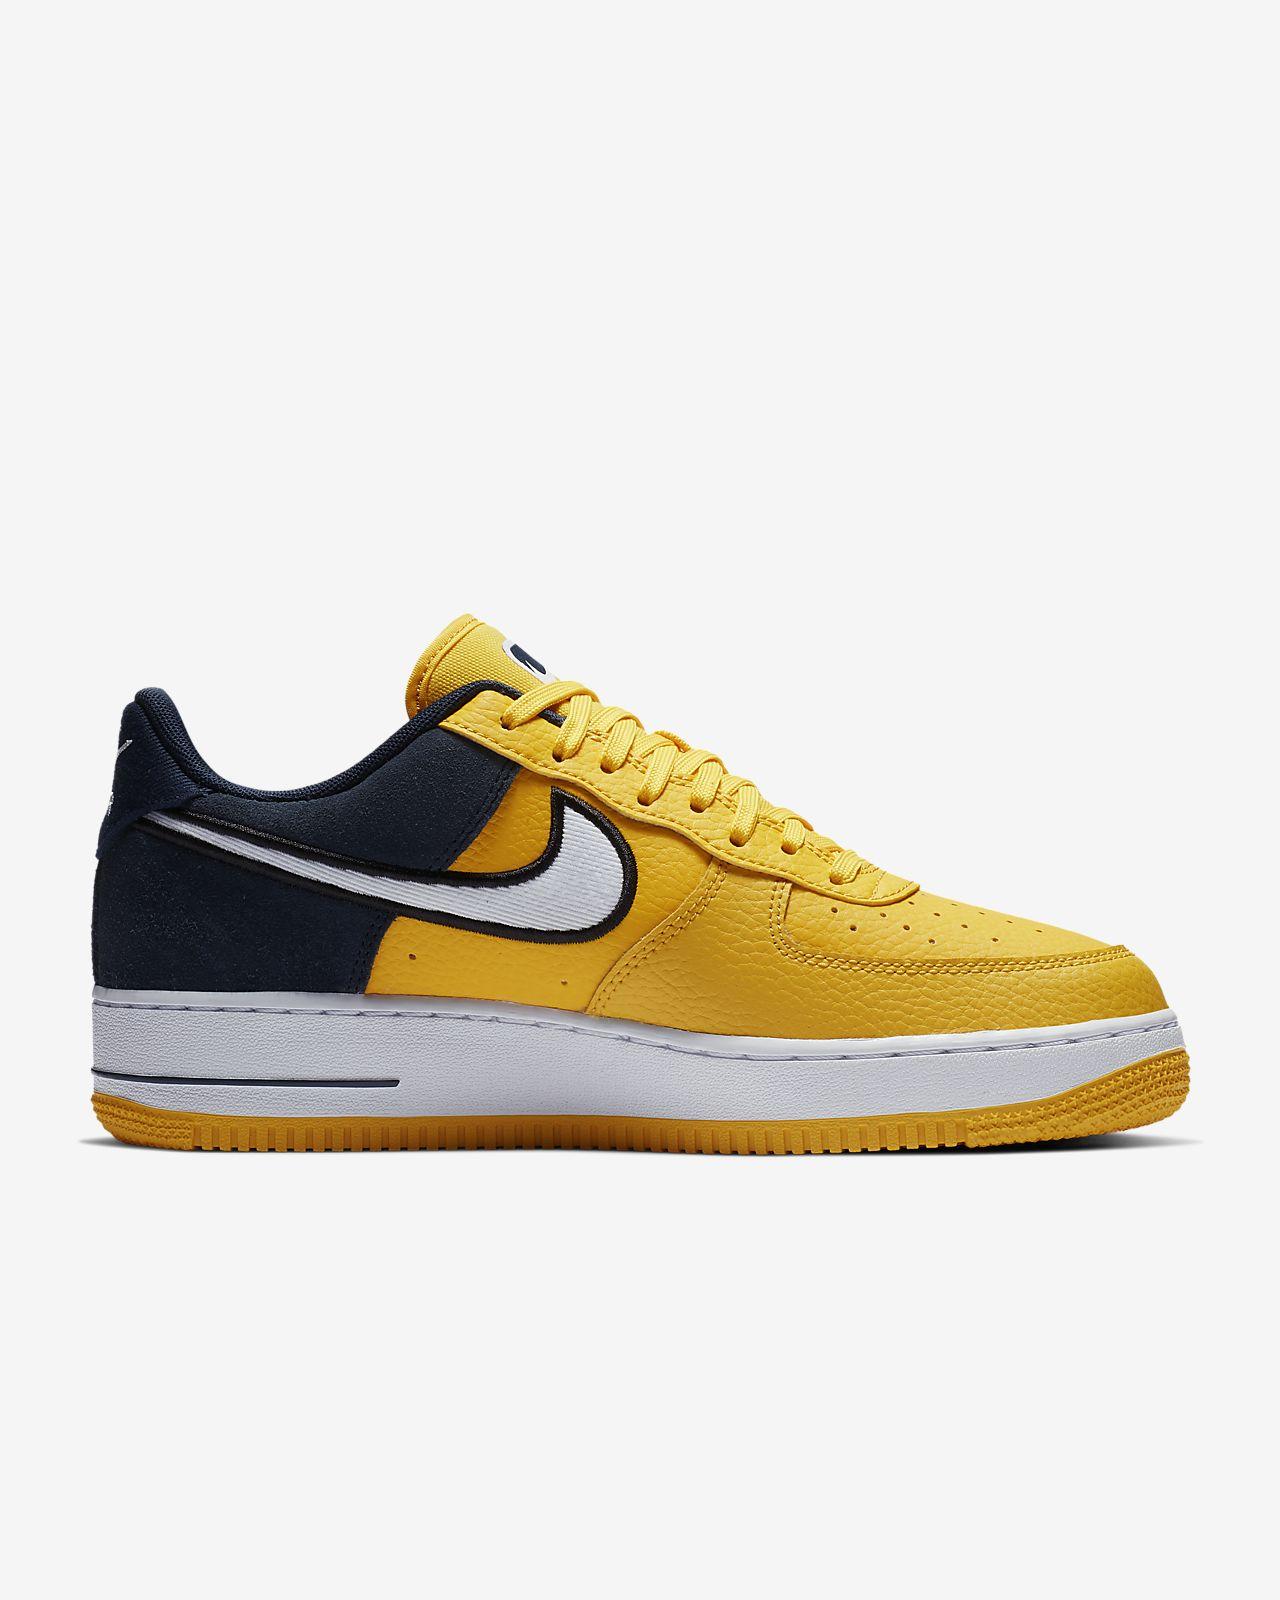 2255503f7 Nike Air Force 1  07 LV8 1 Men s Shoe. Nike.com IN